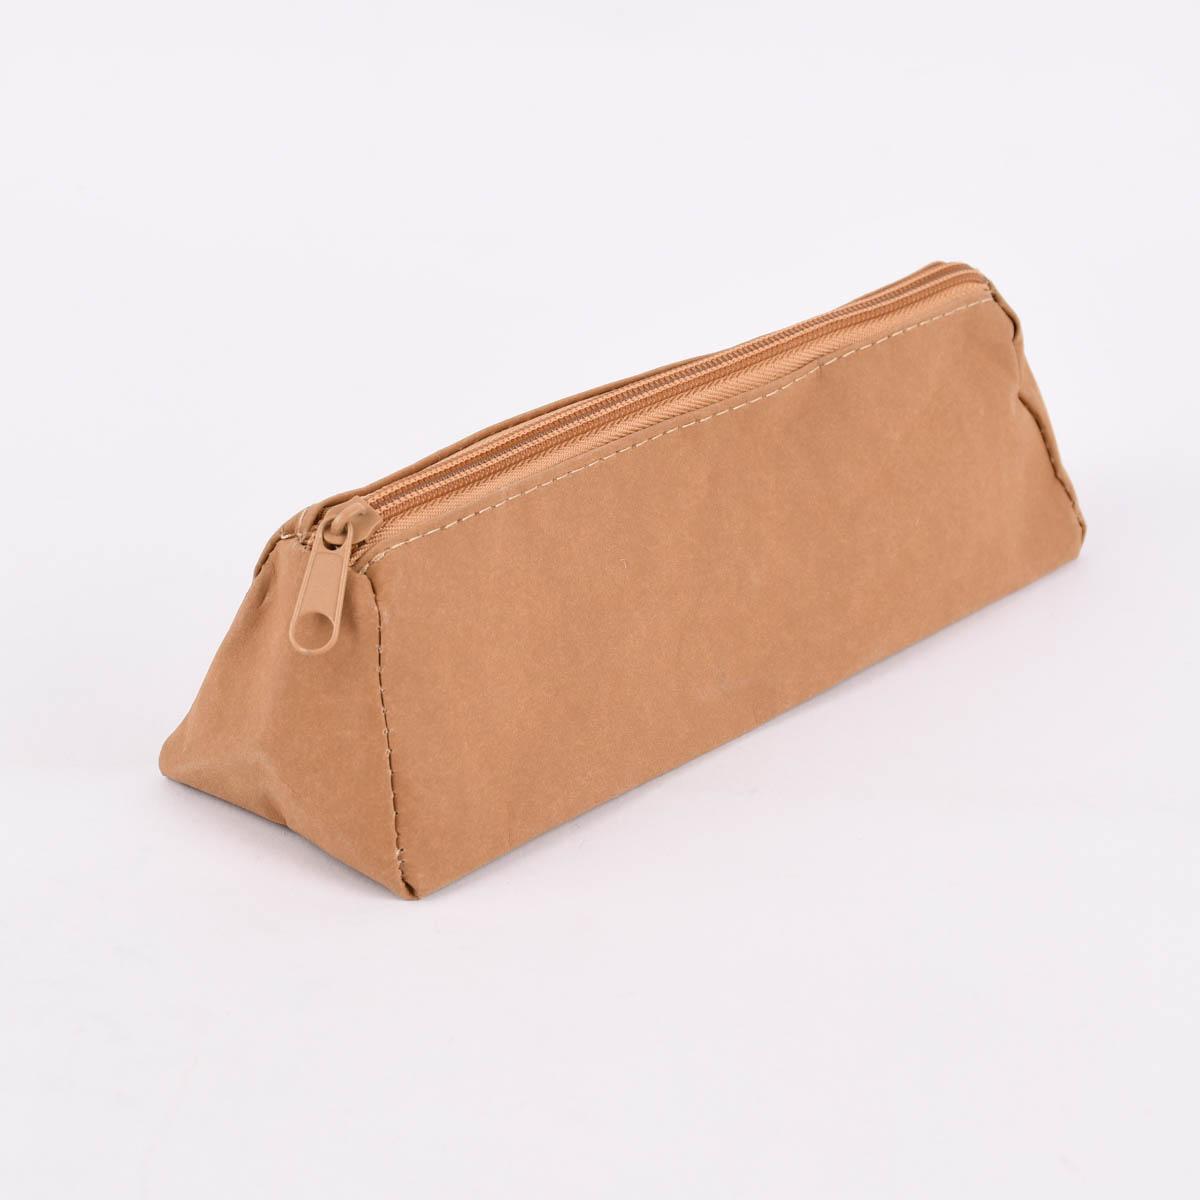 Creativ Company Federmäppchen mit Reißverschluss Lederpapier hellbraun 22x7x7cm